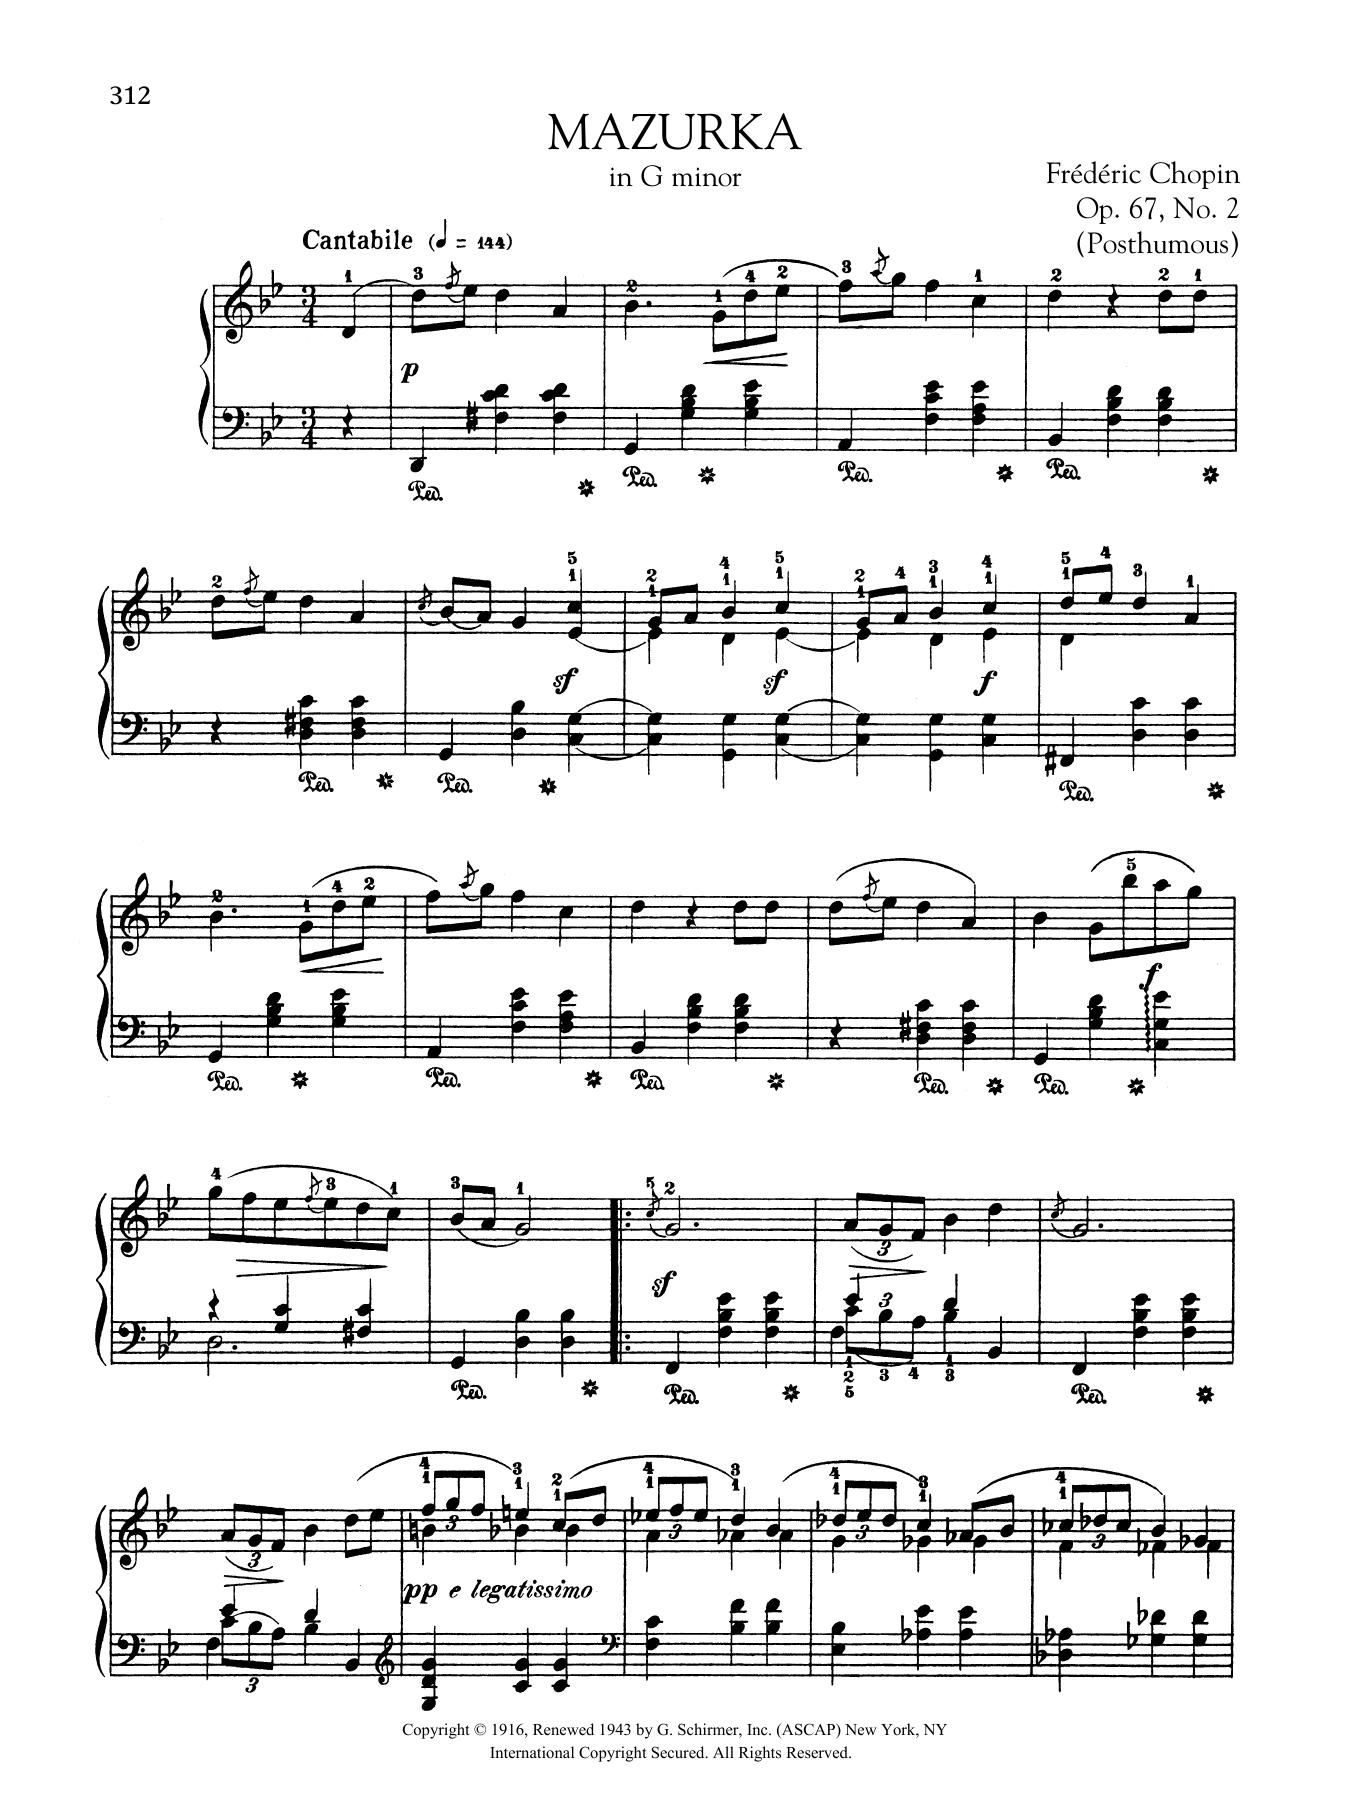 Mazurka in G minor, Op. 67, No. 2 (Posthumous) Sheet Music